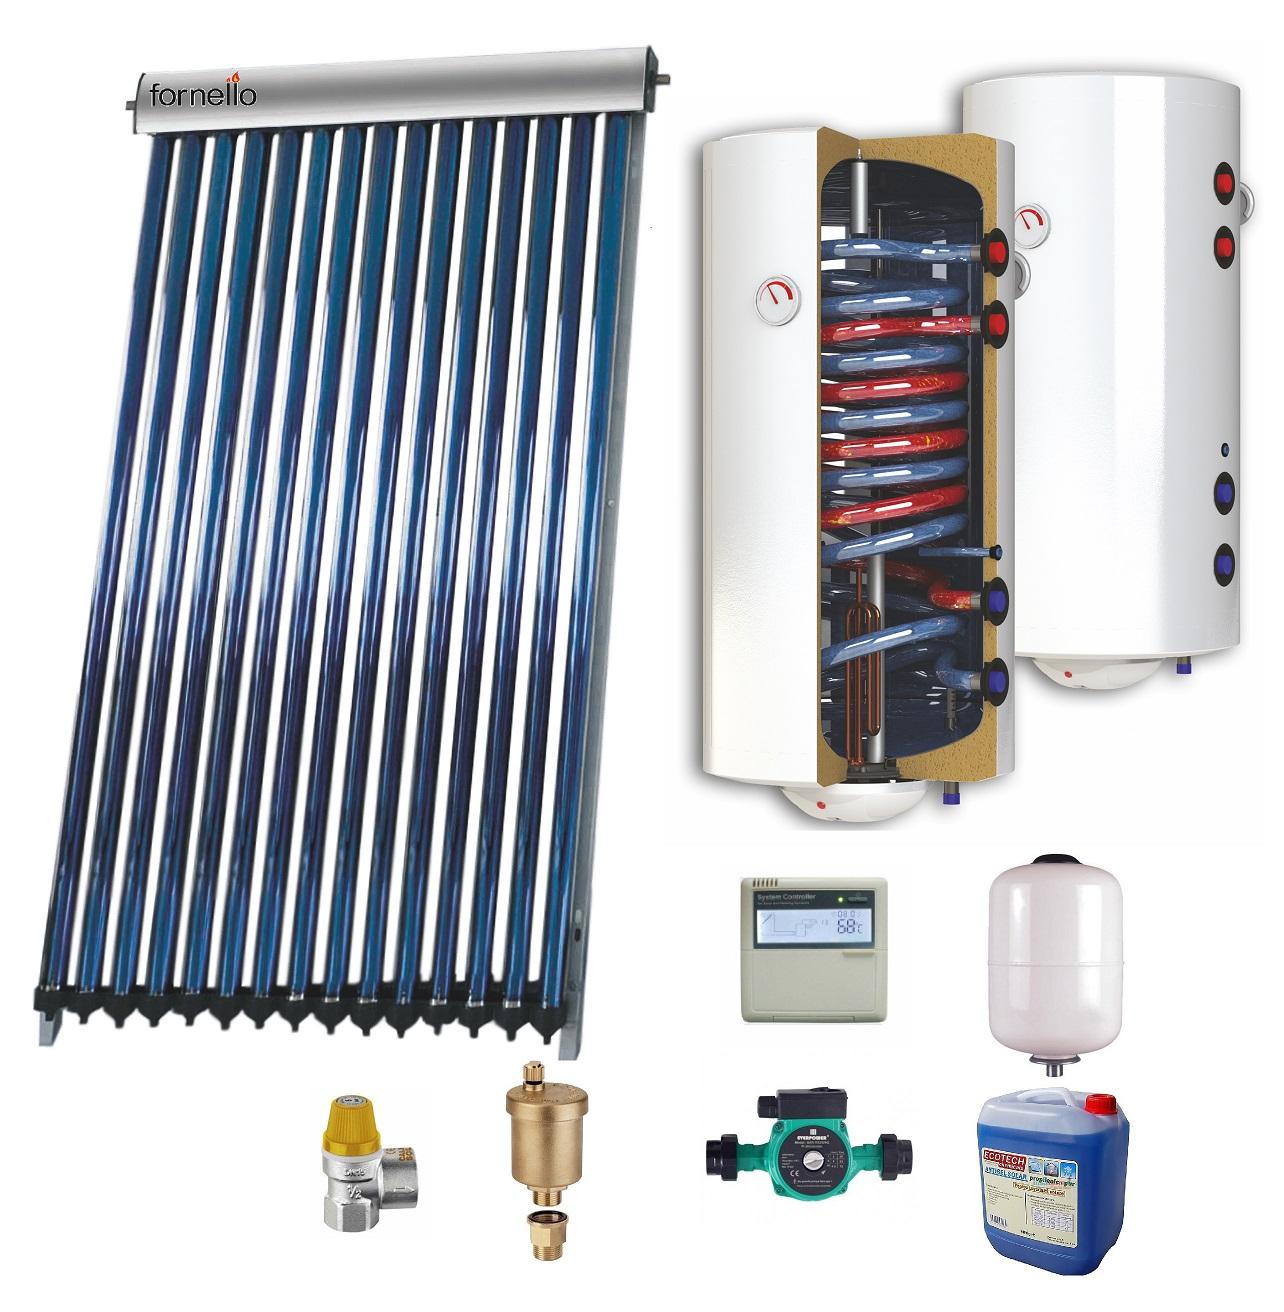 Sistem solar presurizat , panou Sunsystem VTC 15, boiler cu 2 serpentine si rezistenta electrica Sunsystem 150 litri, pompa 25-60, controller, vas expansiune, antigel, supapa 1/2, aerisitor 1/2 fornello imagine